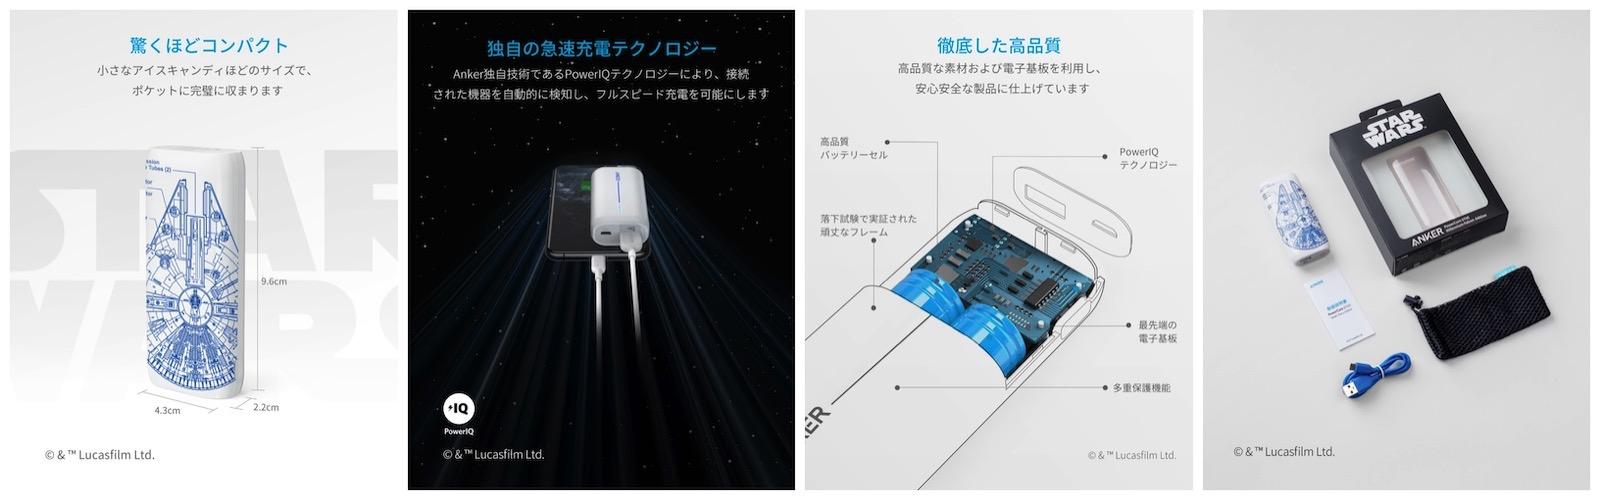 Anker StarWars Collaboration 6